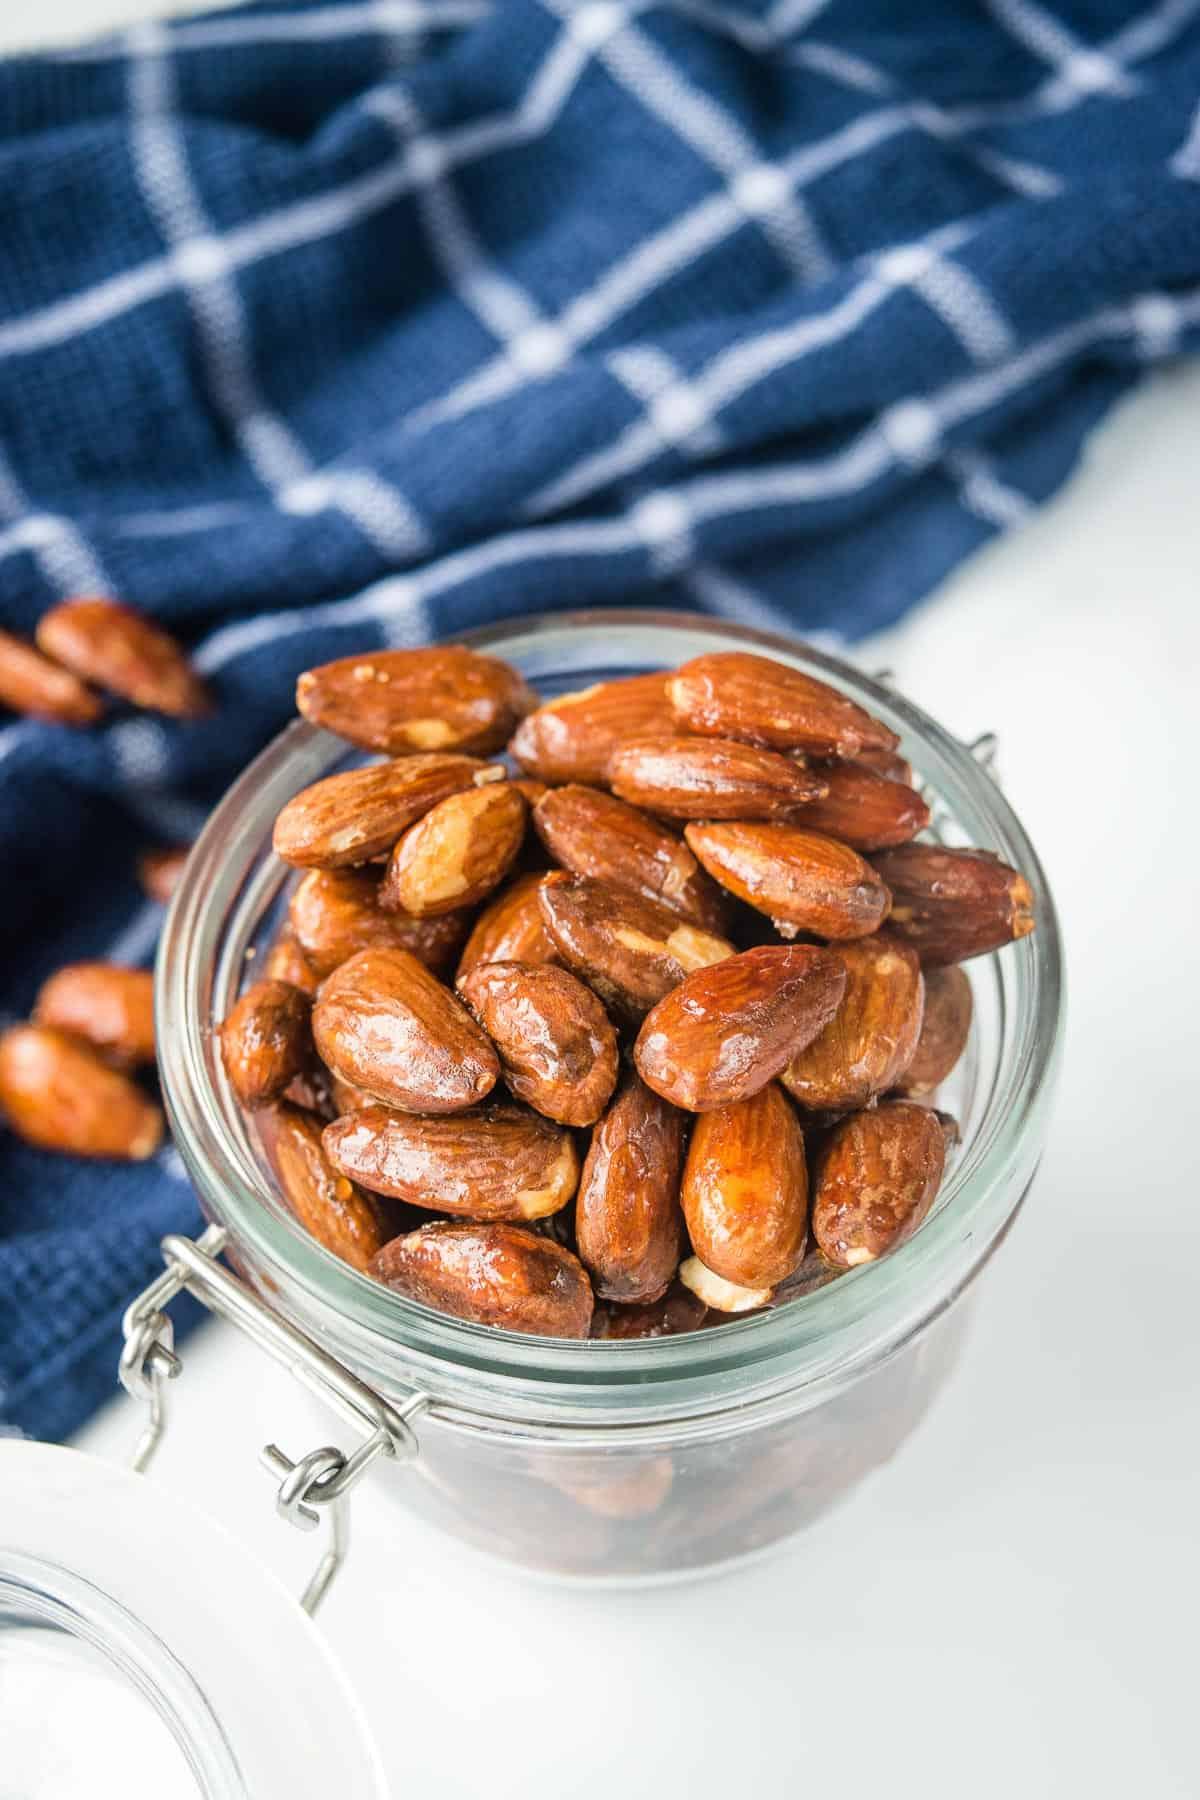 Honey roasted almonds in a jar.